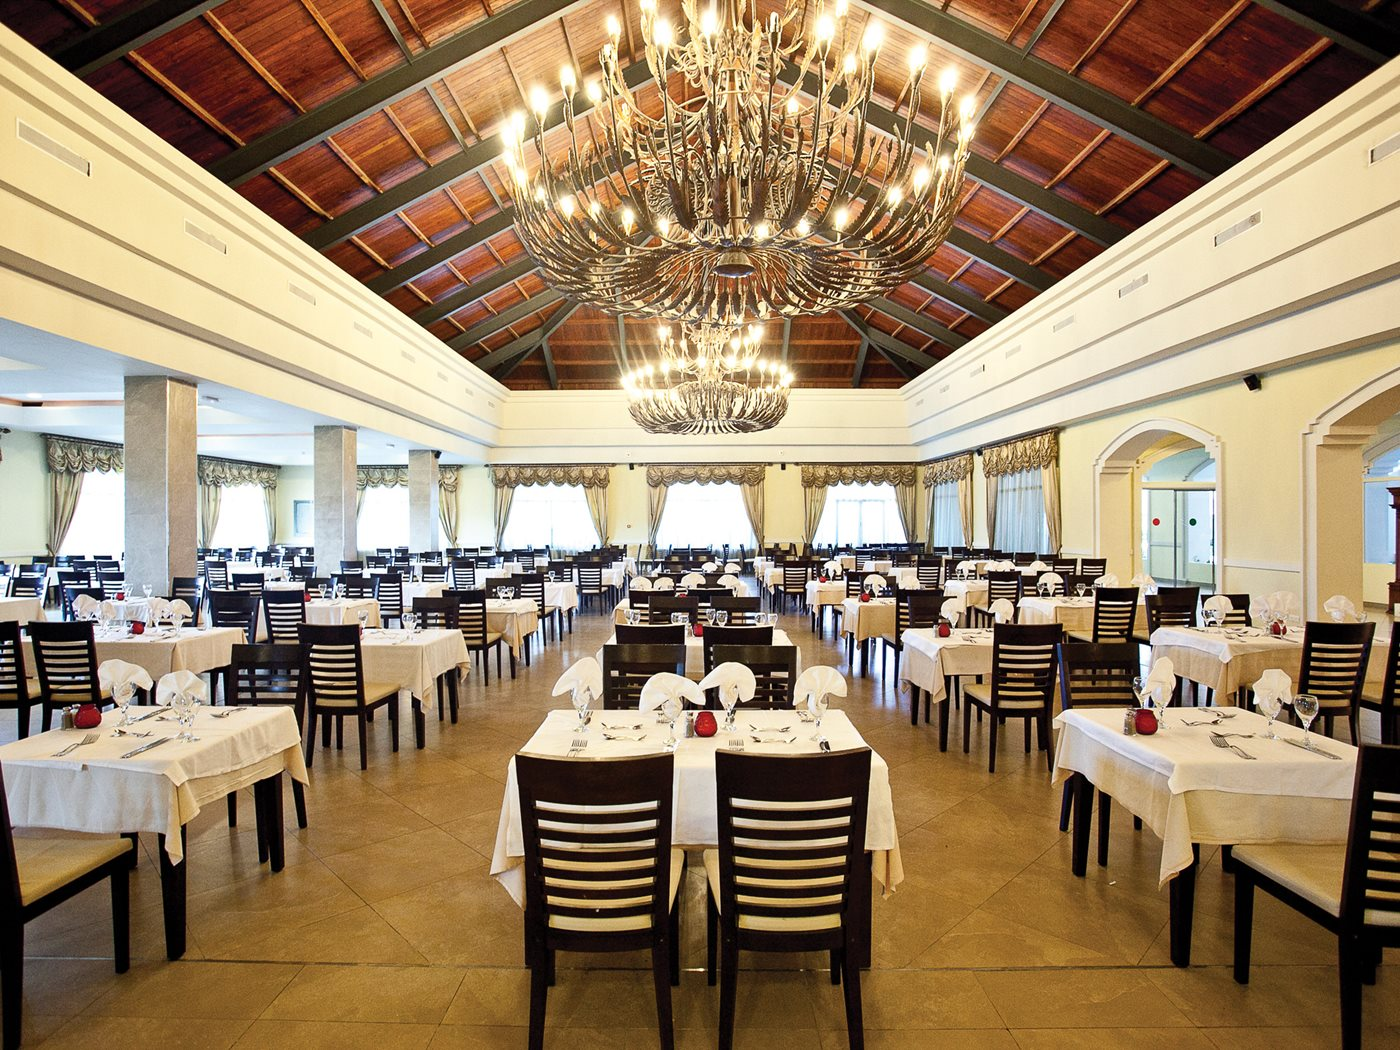 Restaurants And Bars Majestic Elegance Punta Cana 4 5 Flavours Restaurant